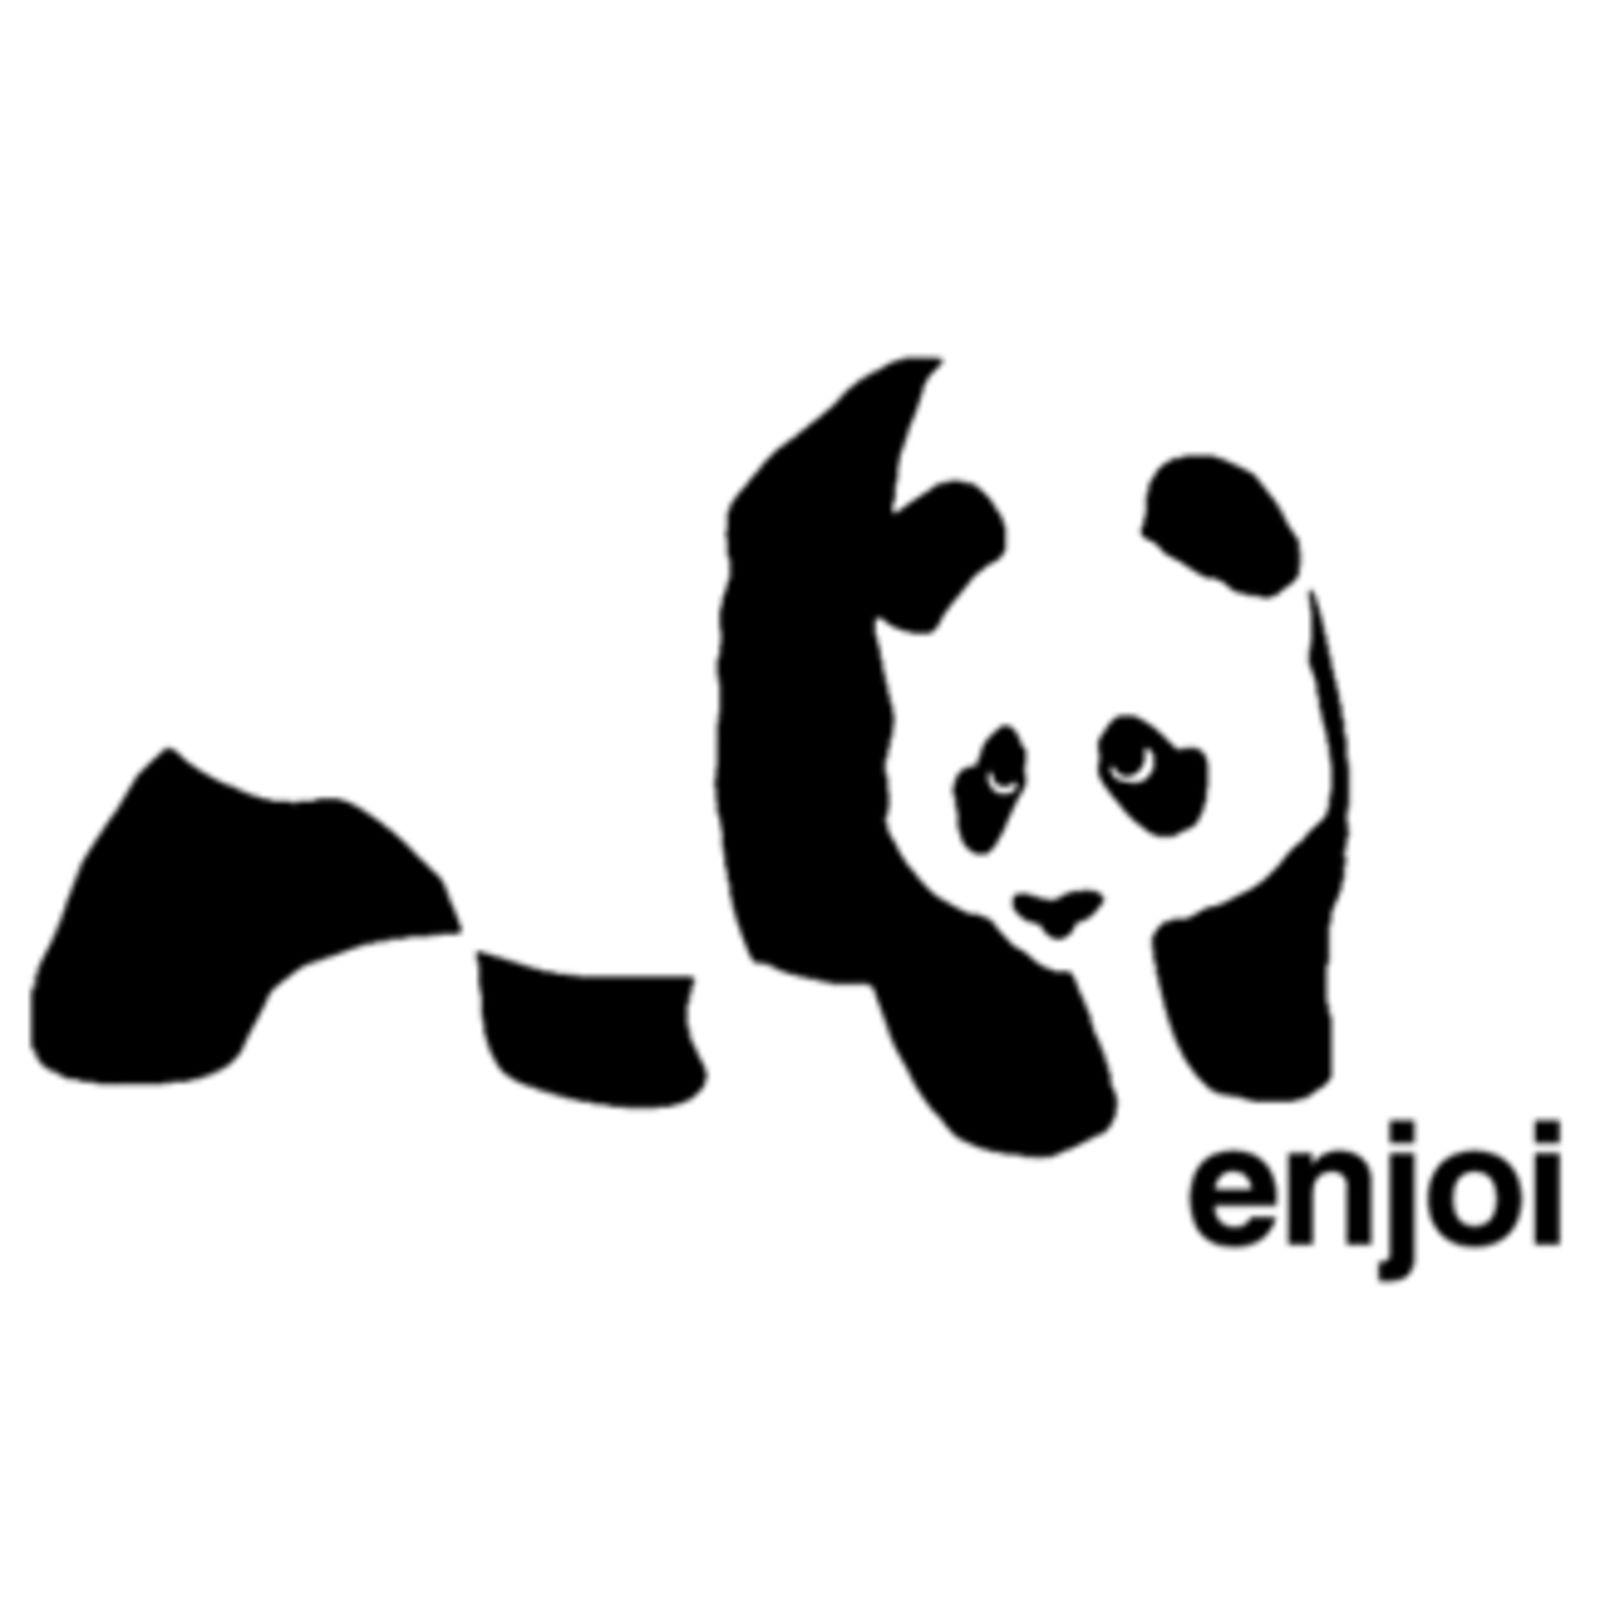 enjoi